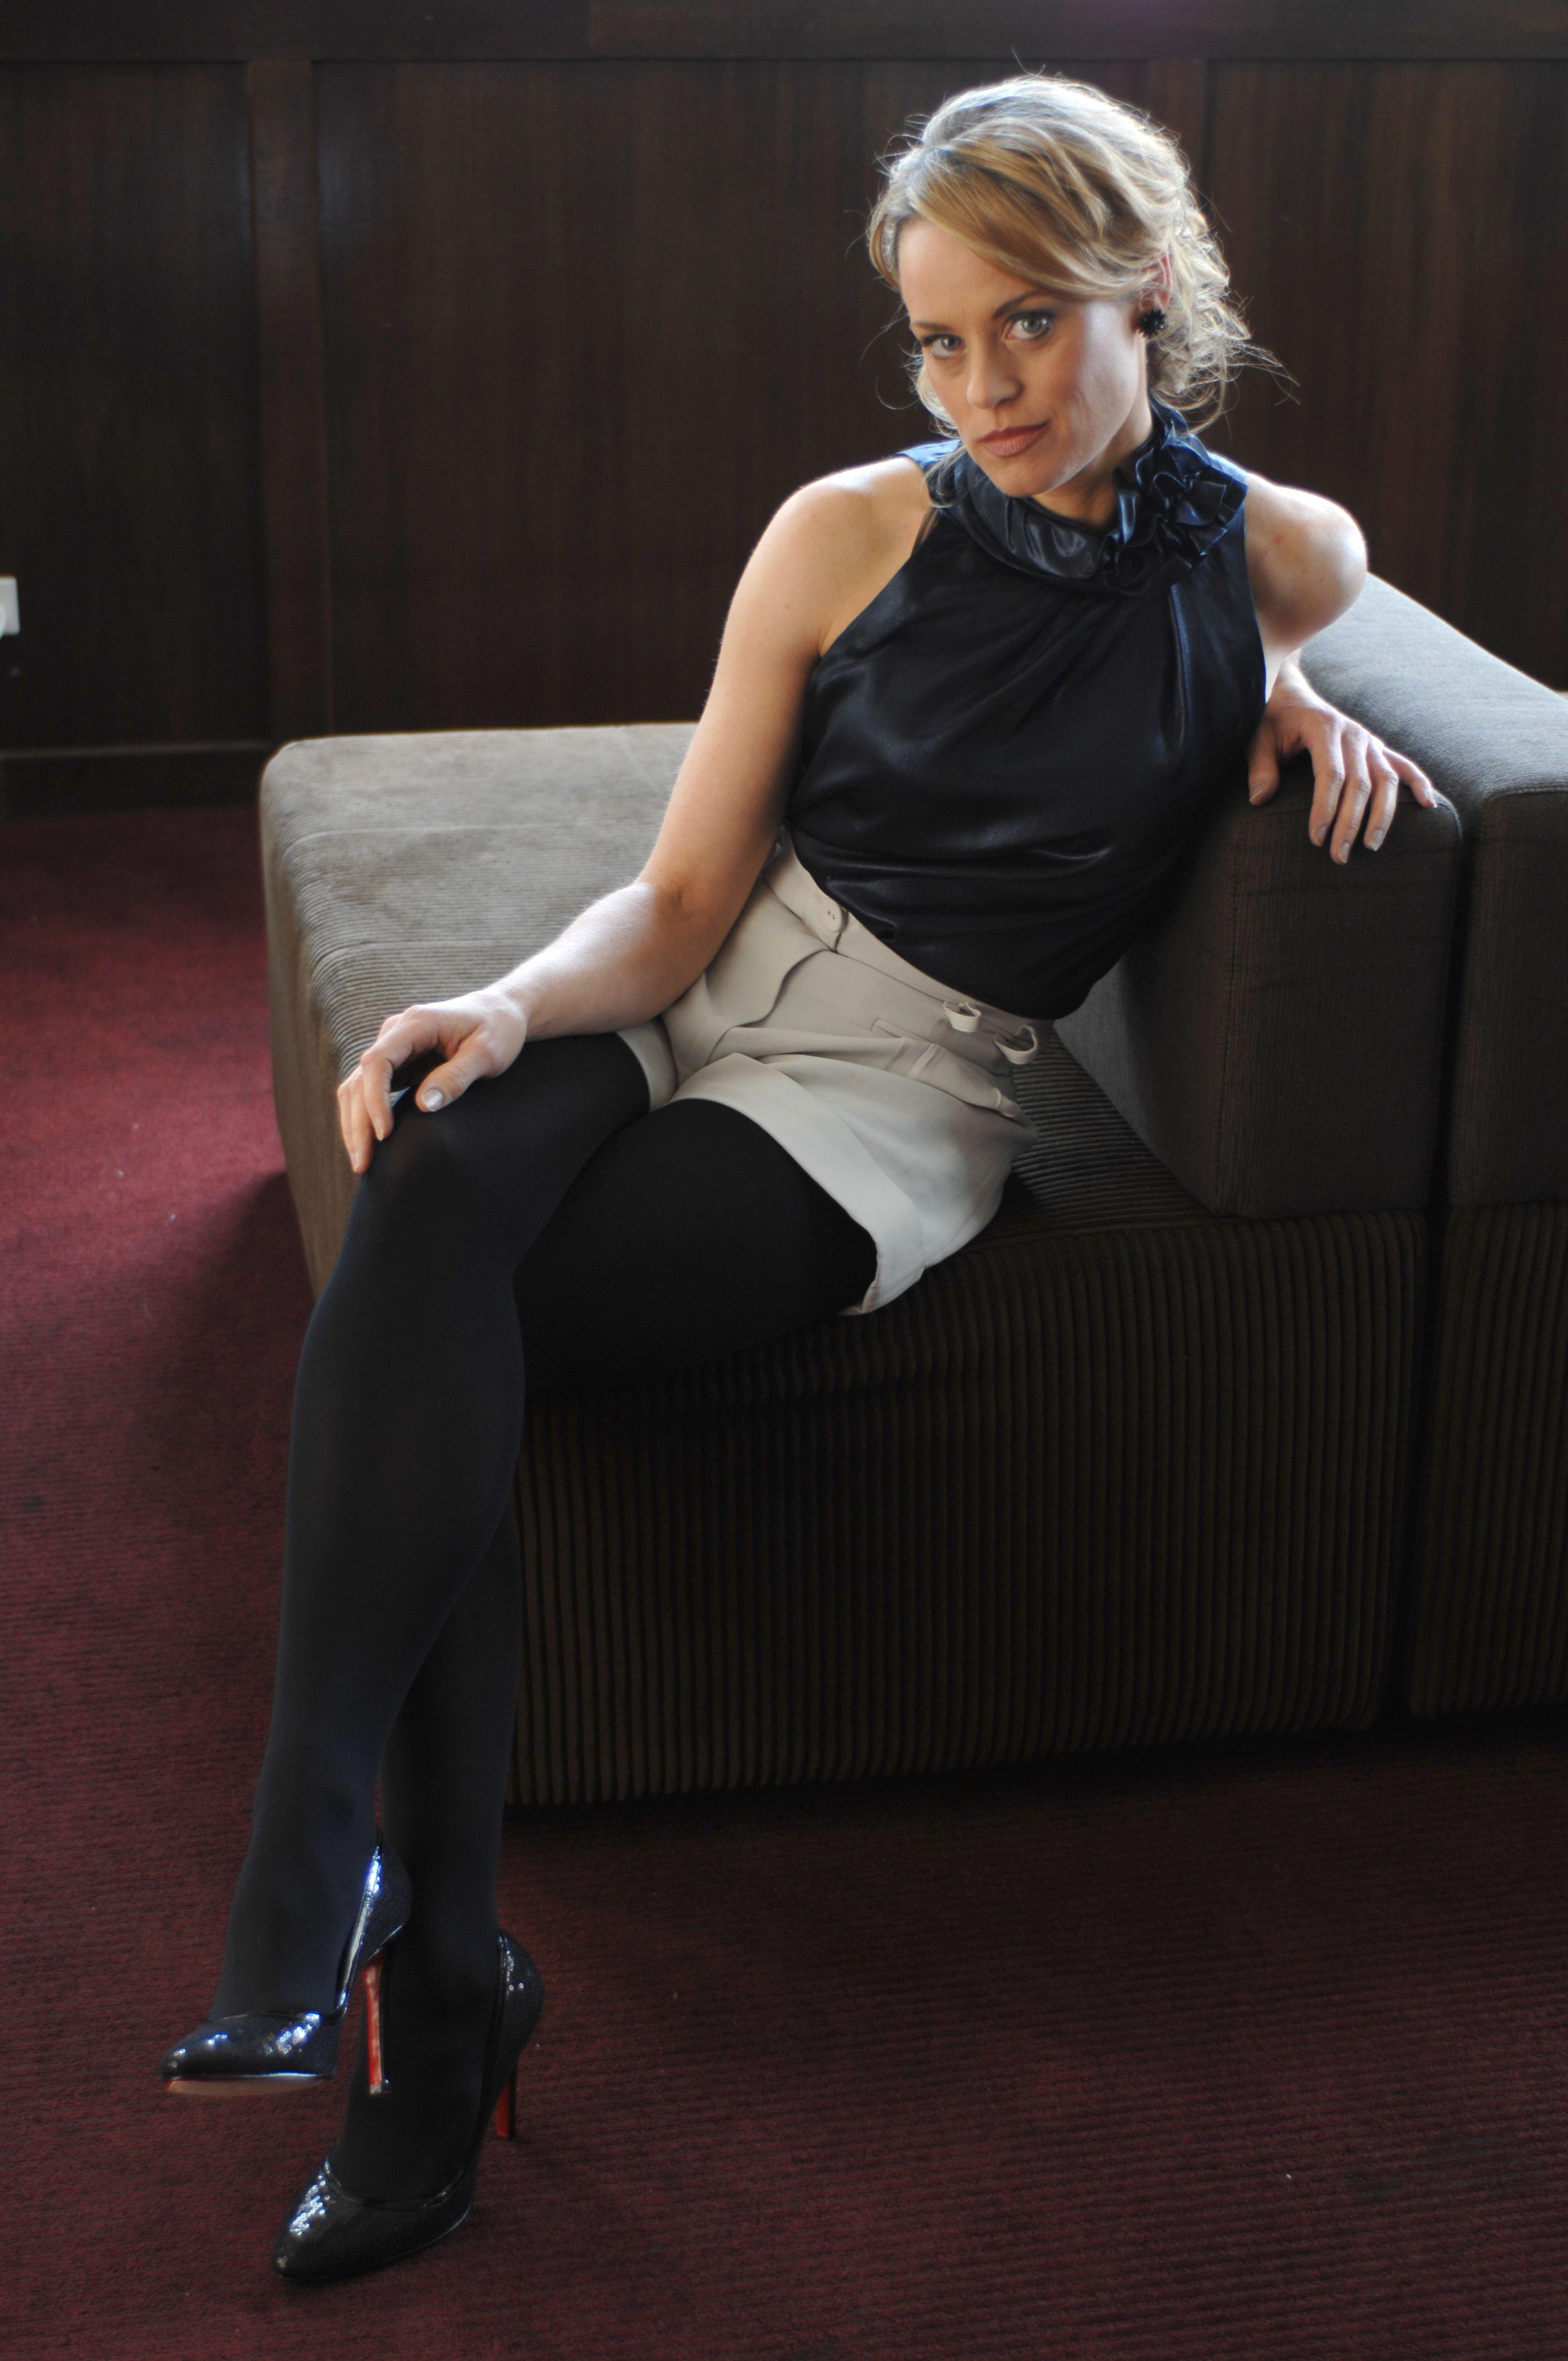 Kristen Alderson born May 29, 1991 (age 27),Esther Dale Erotic images Daniel Sharman (born 1986),Ashleigh Harrington